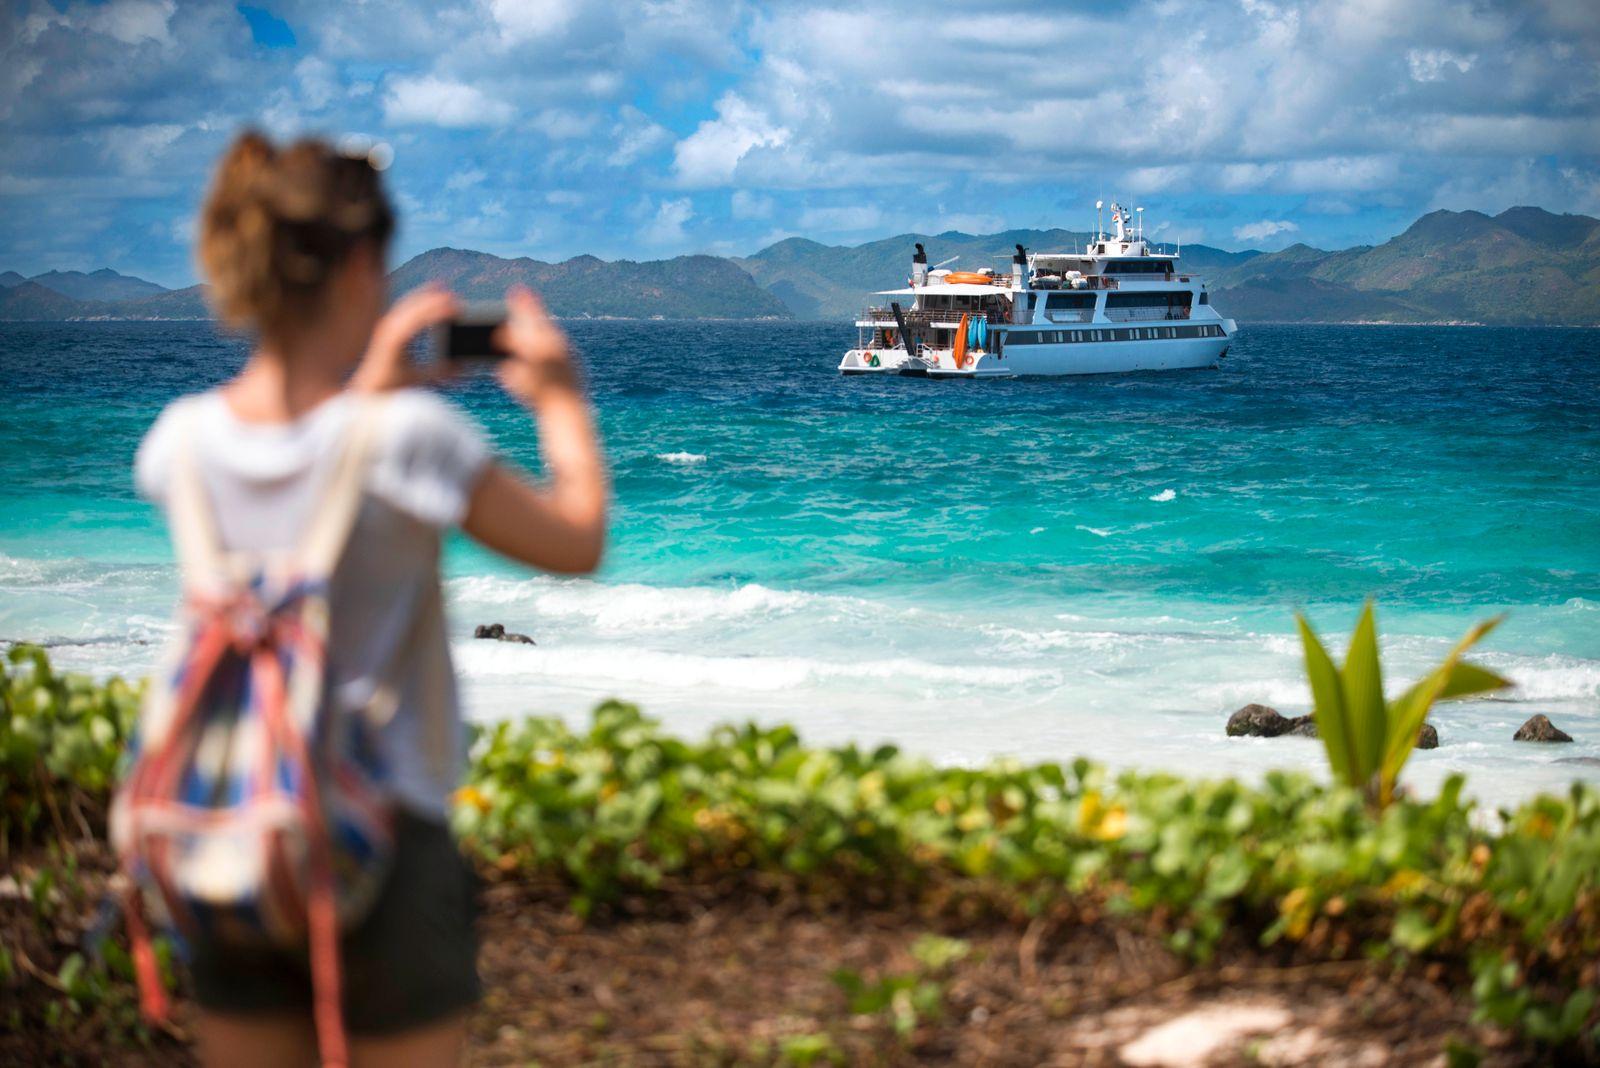 Tourist in Aride Island Seychelles Indian Ocean Africa Seychelles Copyright: xSergixReboredox/xVWPicsx SRE-034-EE2061